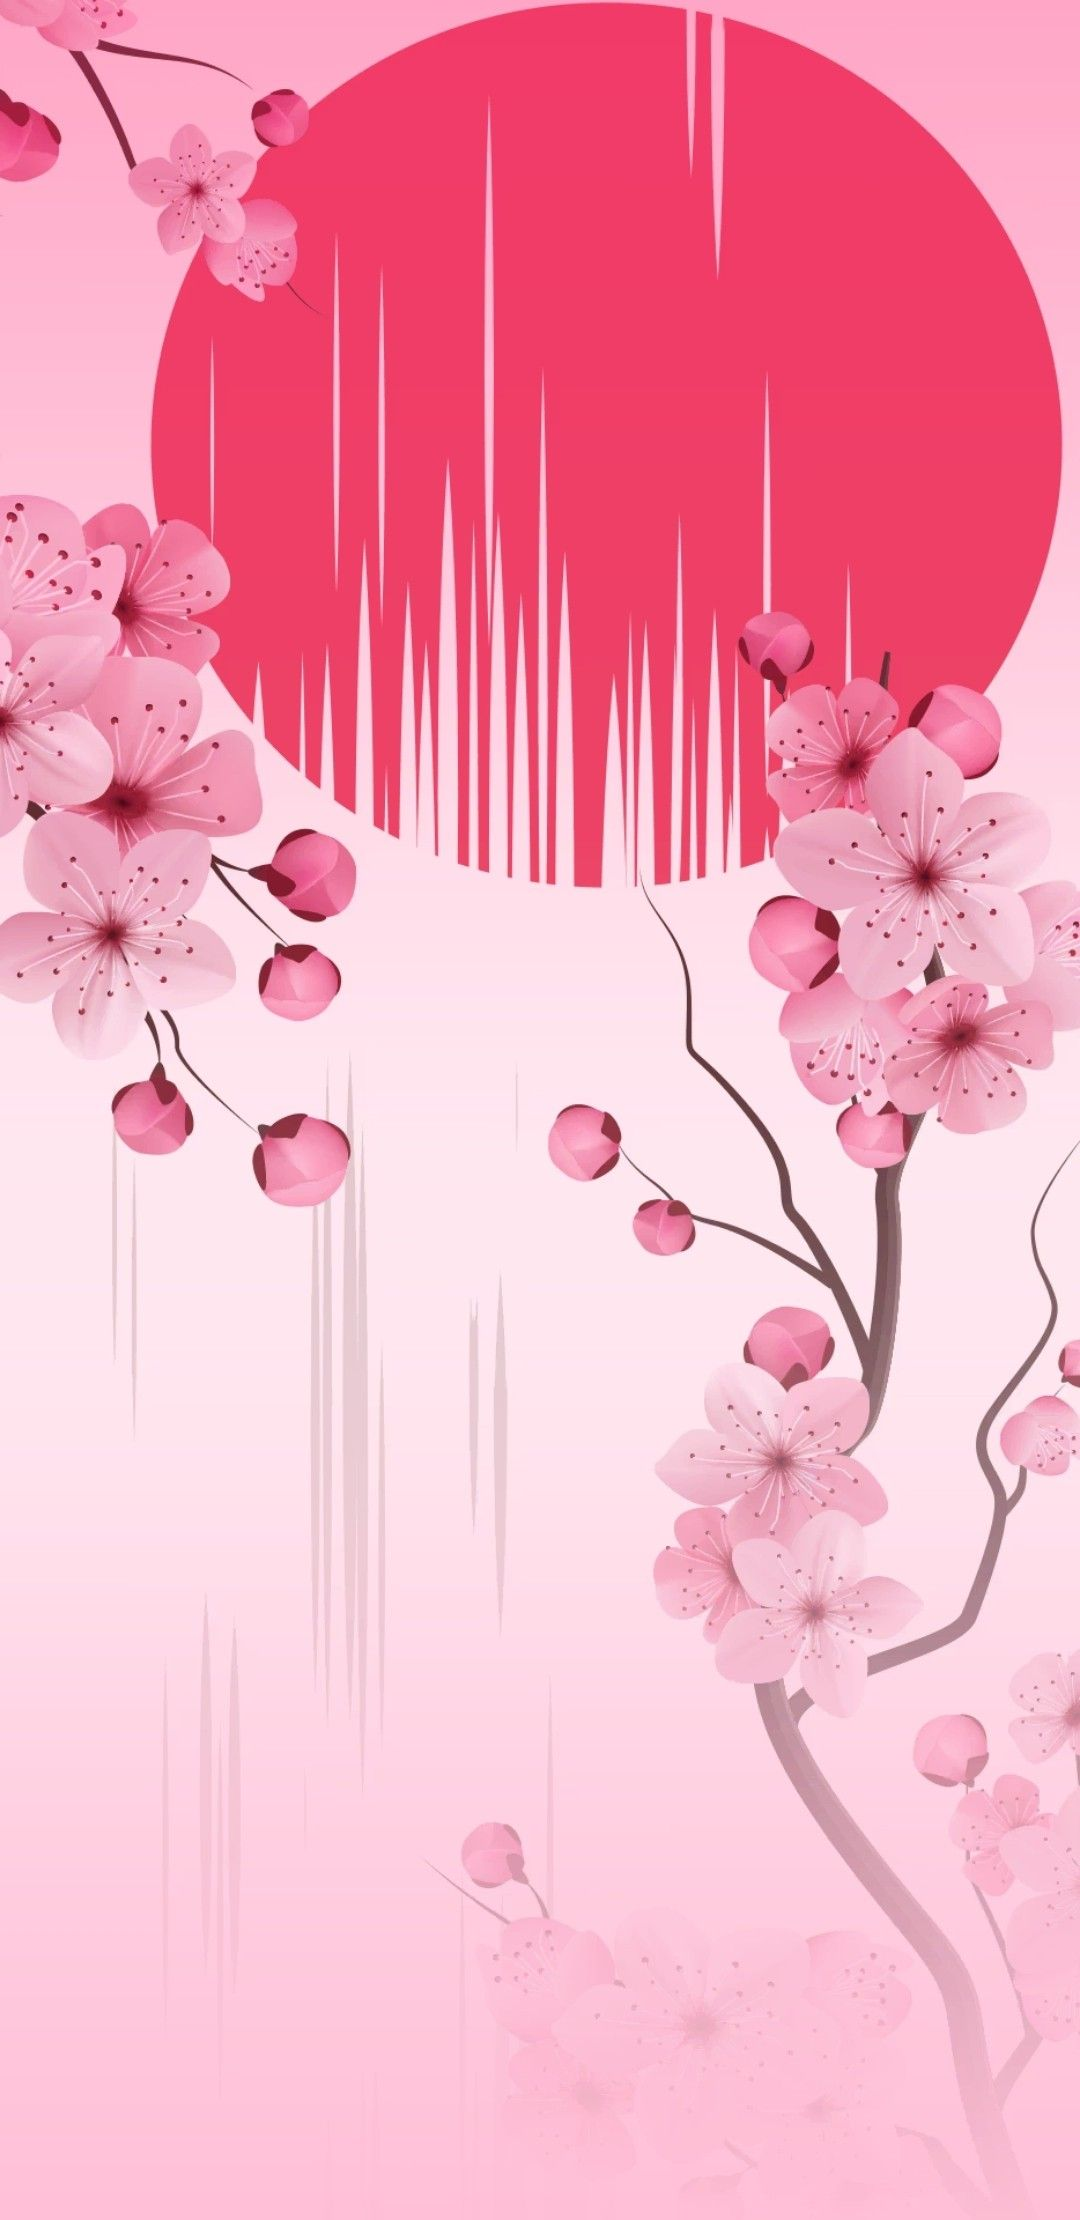 Pin By Yasmin Batista On Japanese Cherry Blossom Wallpaper Cherry Blossom Wallpaper Flower Wallpaper Anime Wallpaper